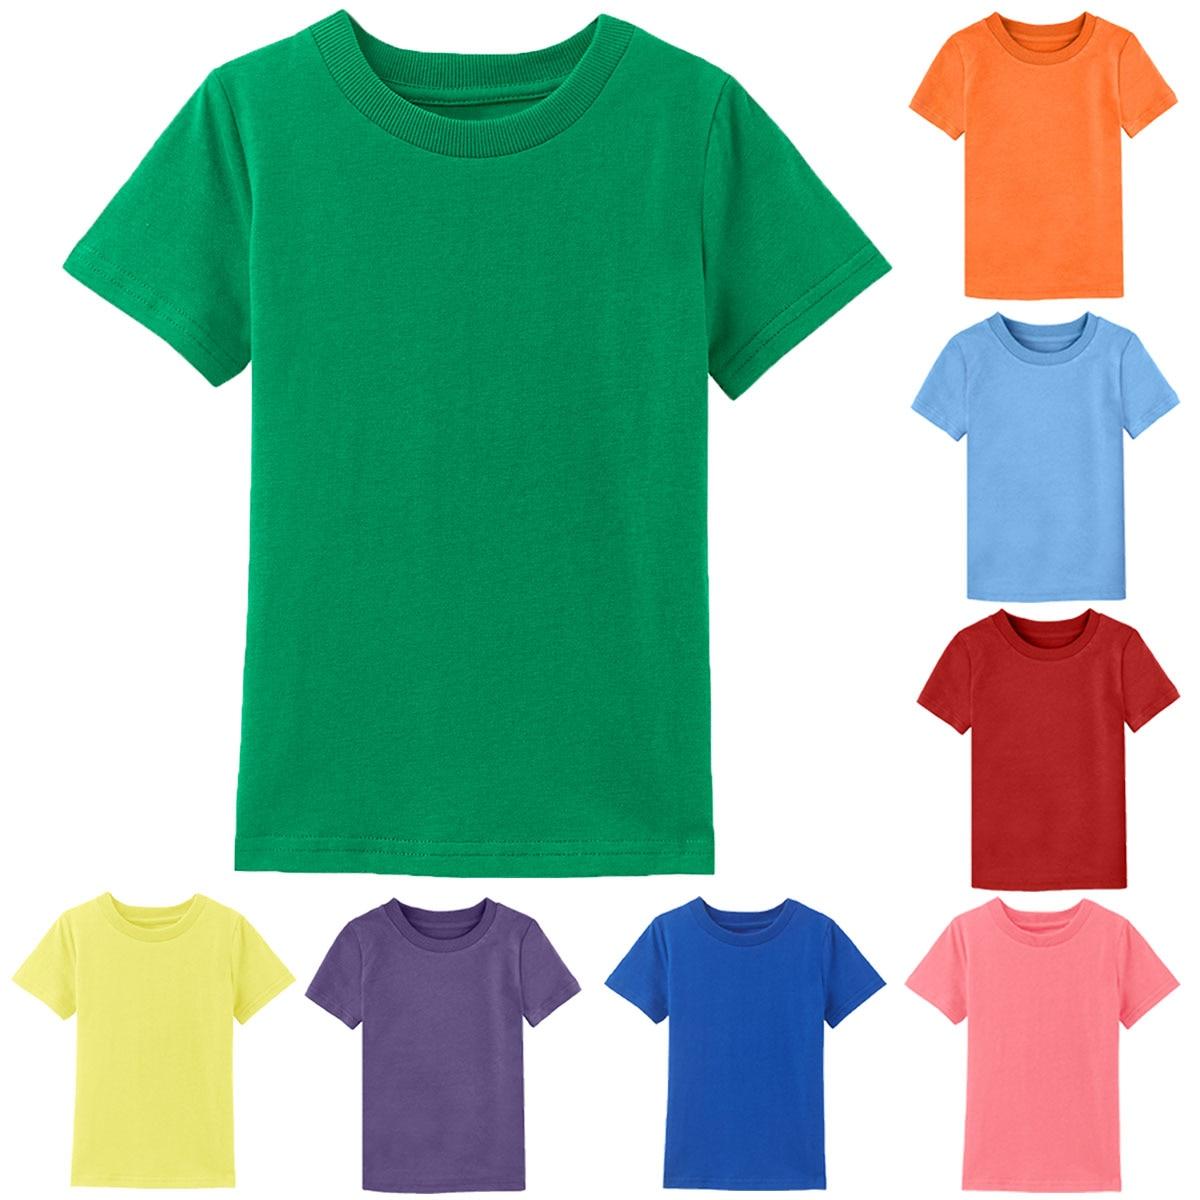 Age 13, Cream Childrens Basic Top Kids Unisex Boys Girls Long Sleeve Plain T-Shirt Top Tee School PE Summer Book Day